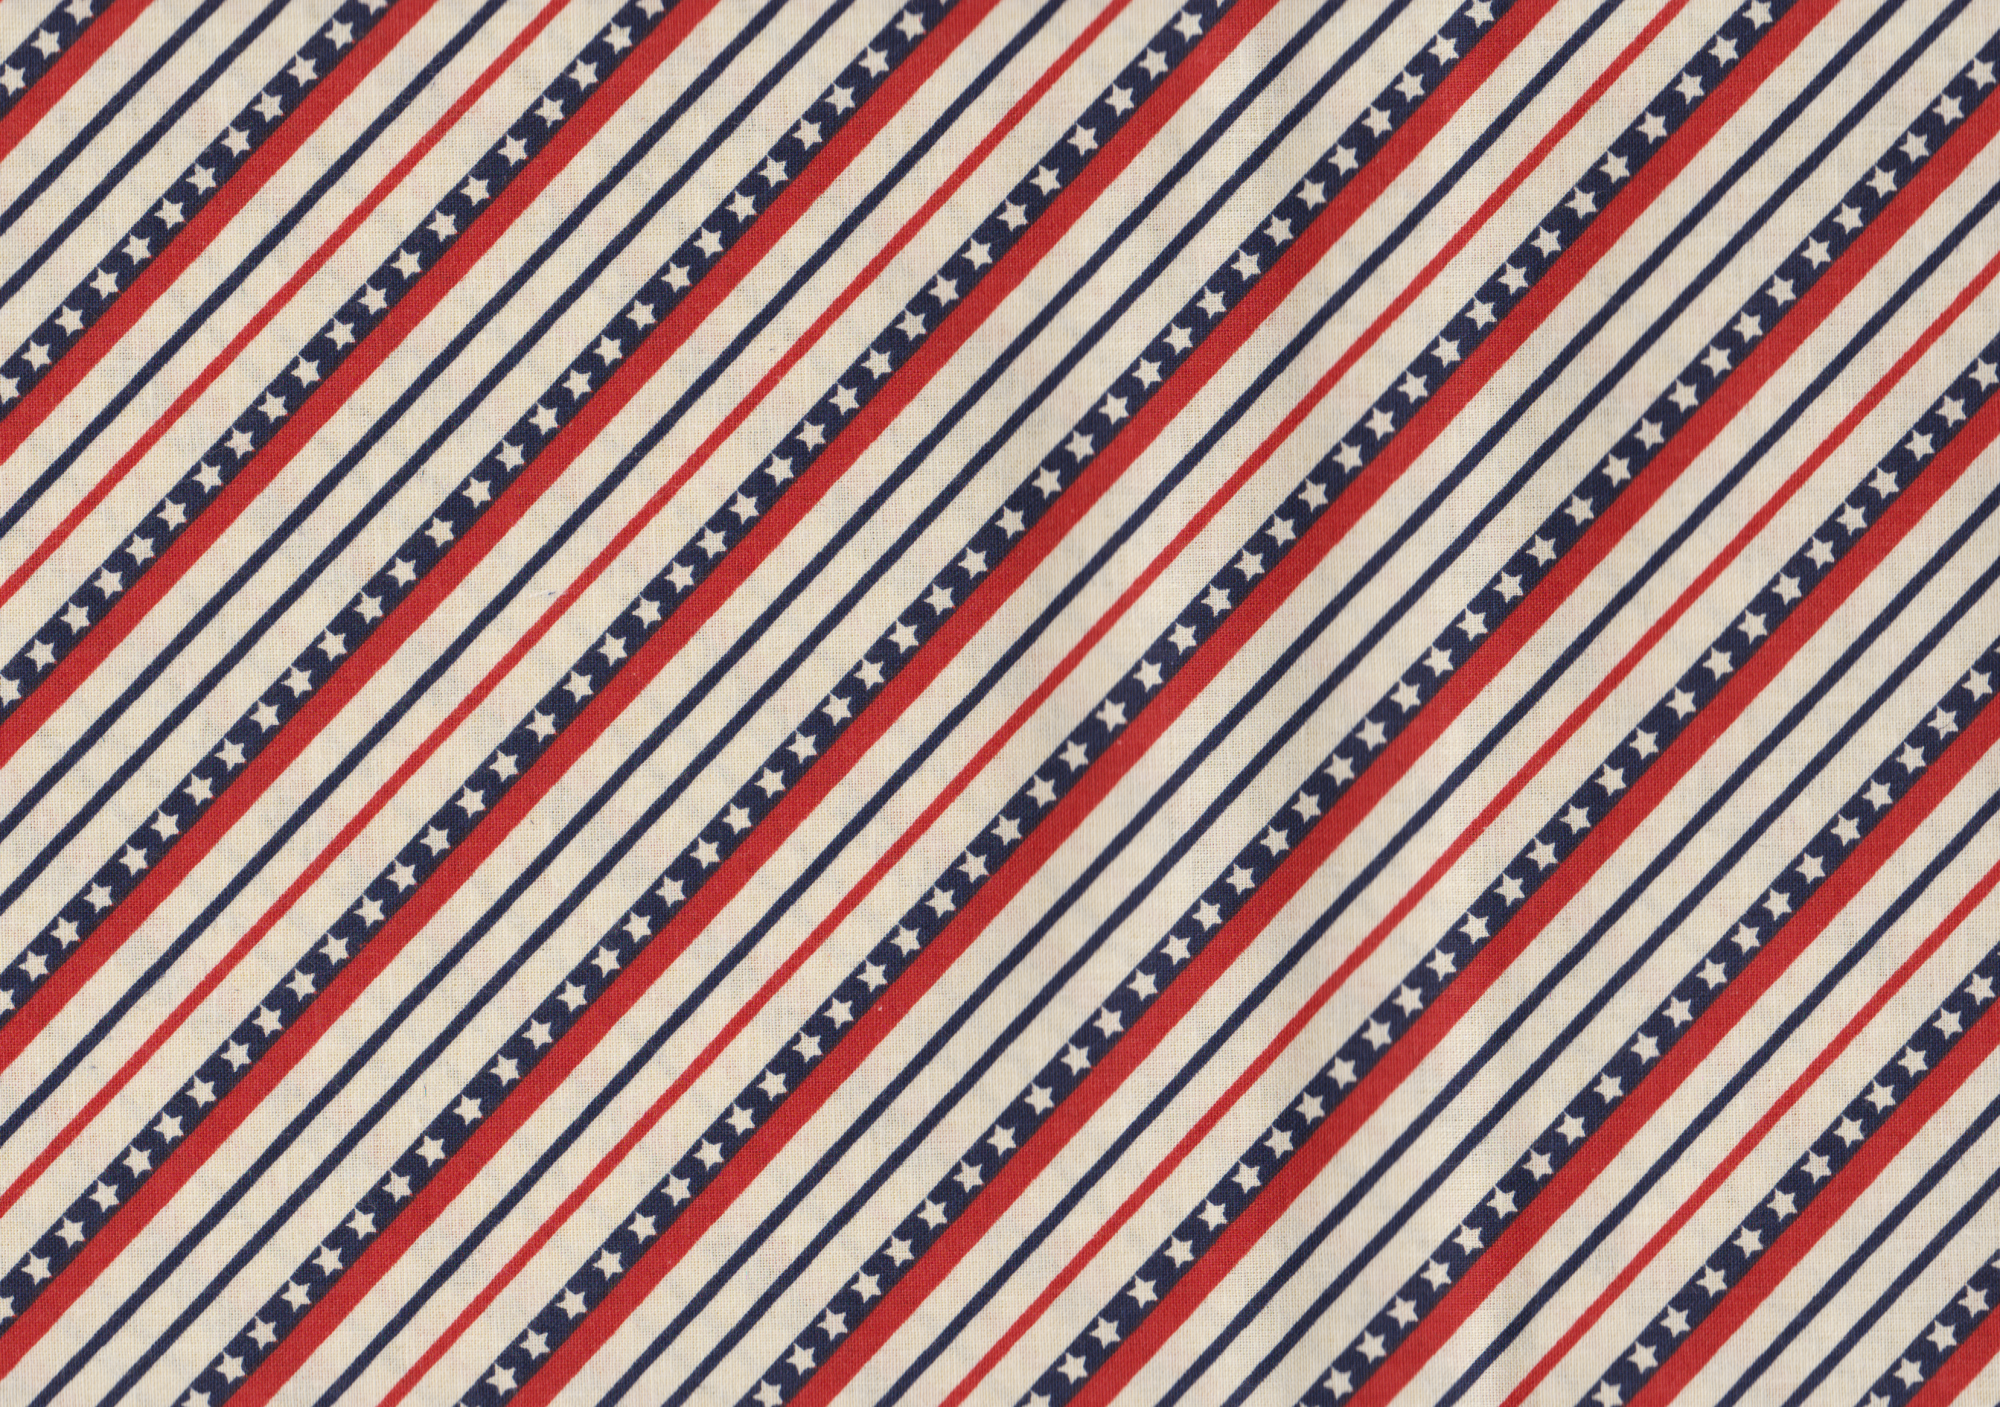 PROMO* FT-Patriotic Prints 12557 Cream - Bias Star Stripe